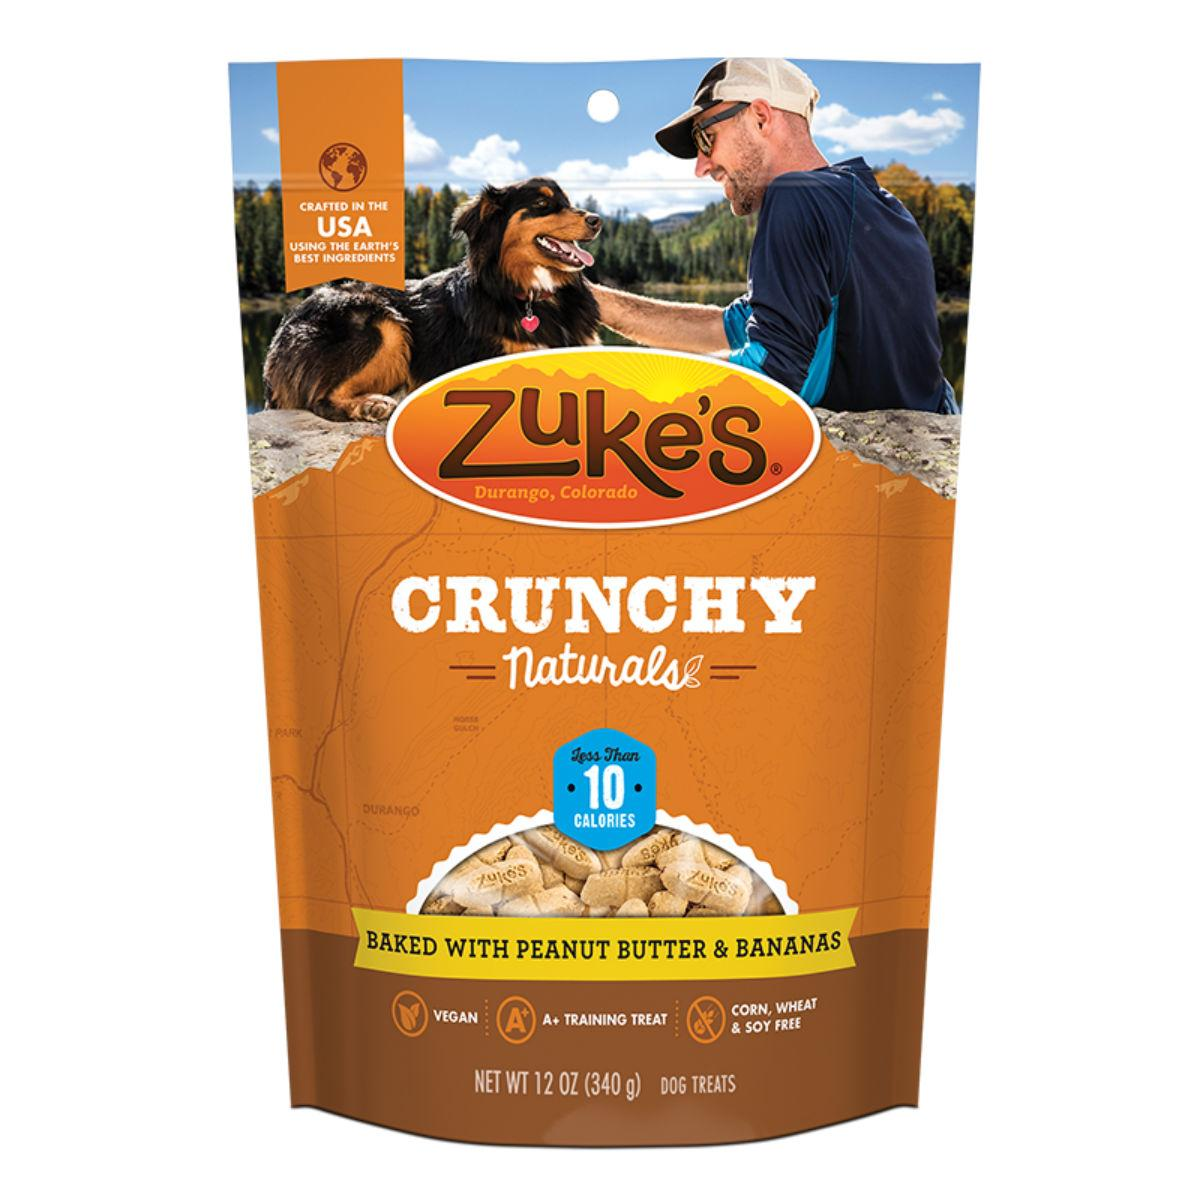 Zuke's Crunchy Naturals Dog Treats - Peanut Butter and Bananas